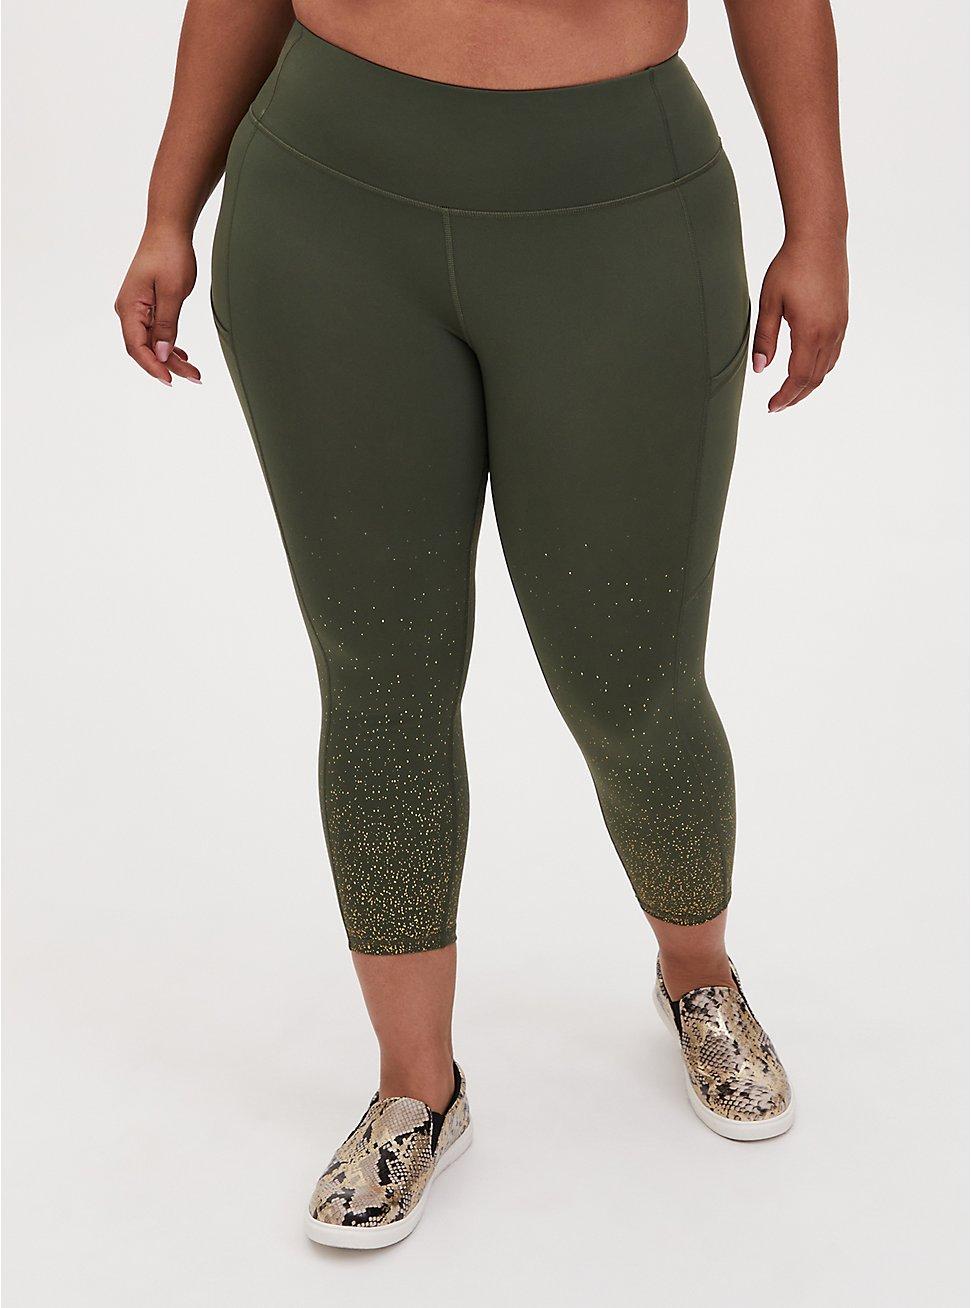 Olive Green & Gold Dot Crop Wicking Active Legging With Pockets, OLIVE, hi-res